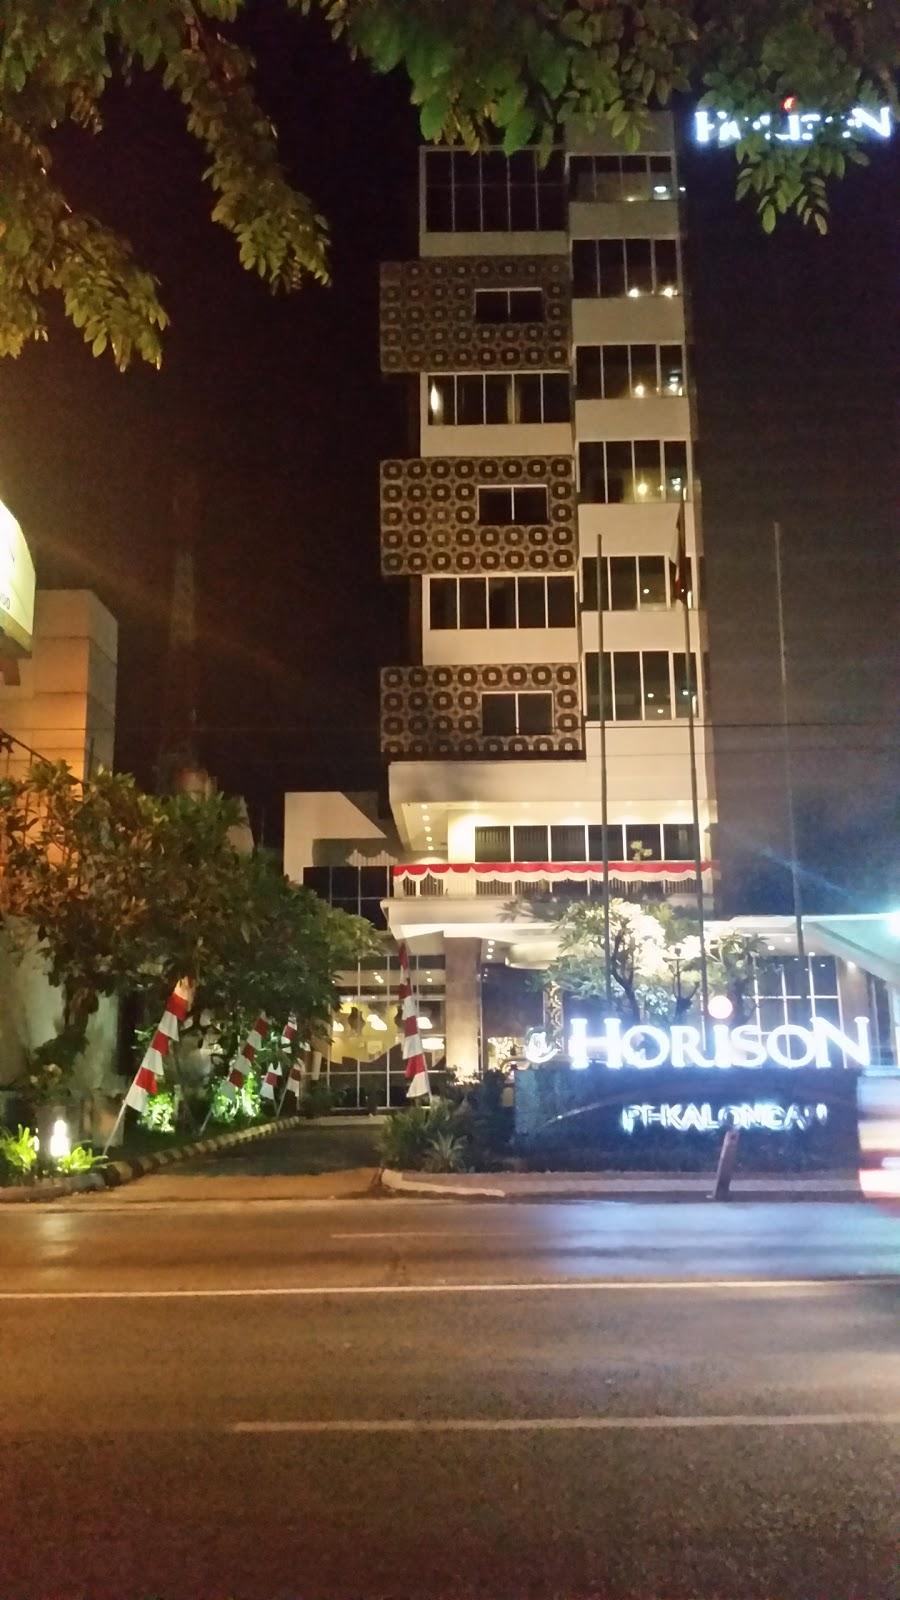 Hotel Horison Pekalongan 62 285 4499000 Jalan Gajah Mada No 11a Kramatsari Pekalongan Barat Kramatsari Pekalongan Bar Kota Pekalongan Jawa Tengah 51118 Indonesia